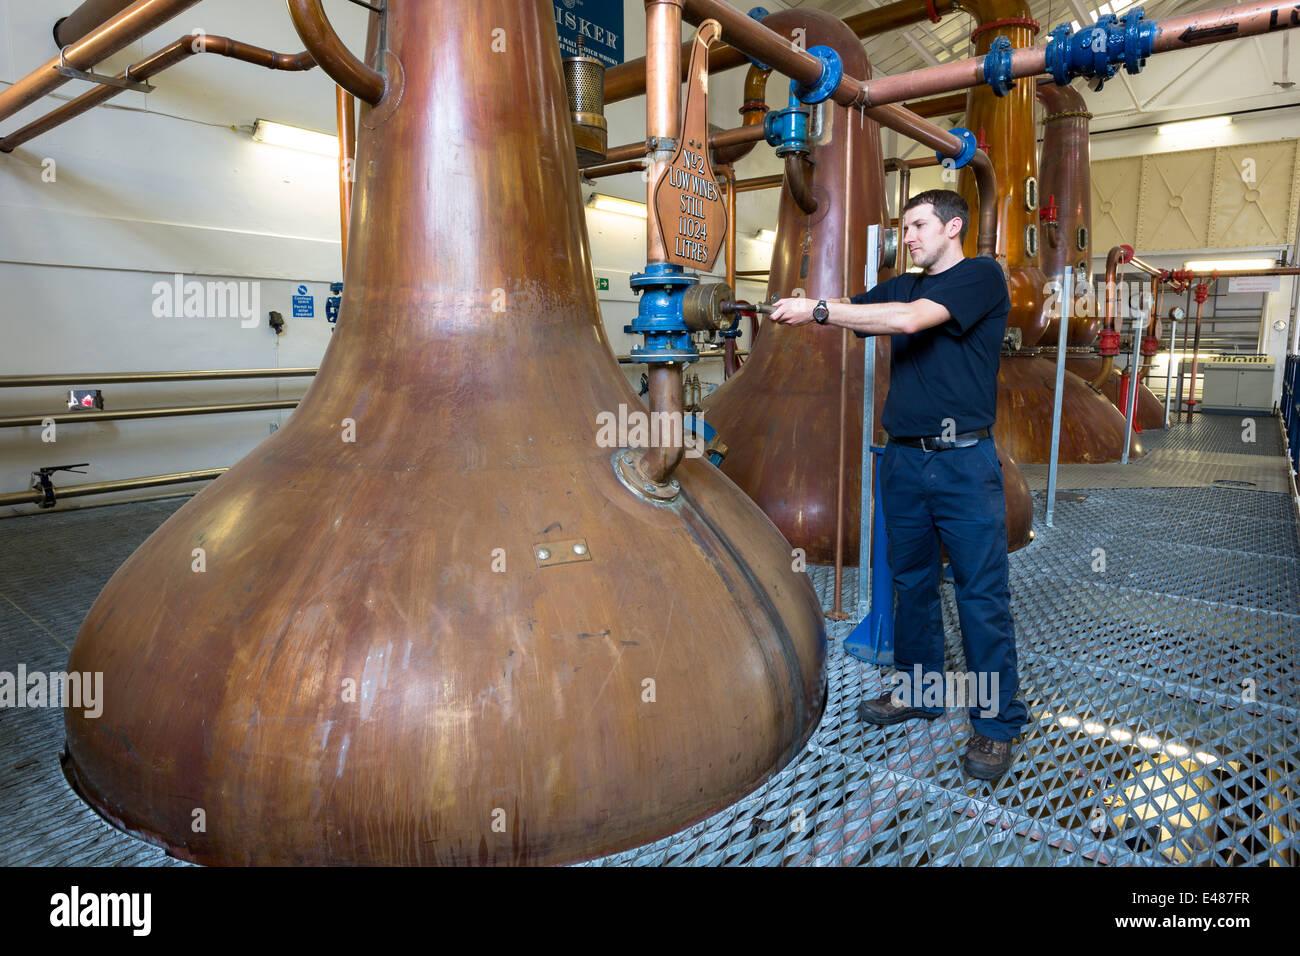 Stillsman and copper spirit stills in Stillshouse at Talisker Whisky Distillery makes single malt in Isle of Skye, - Stock Image